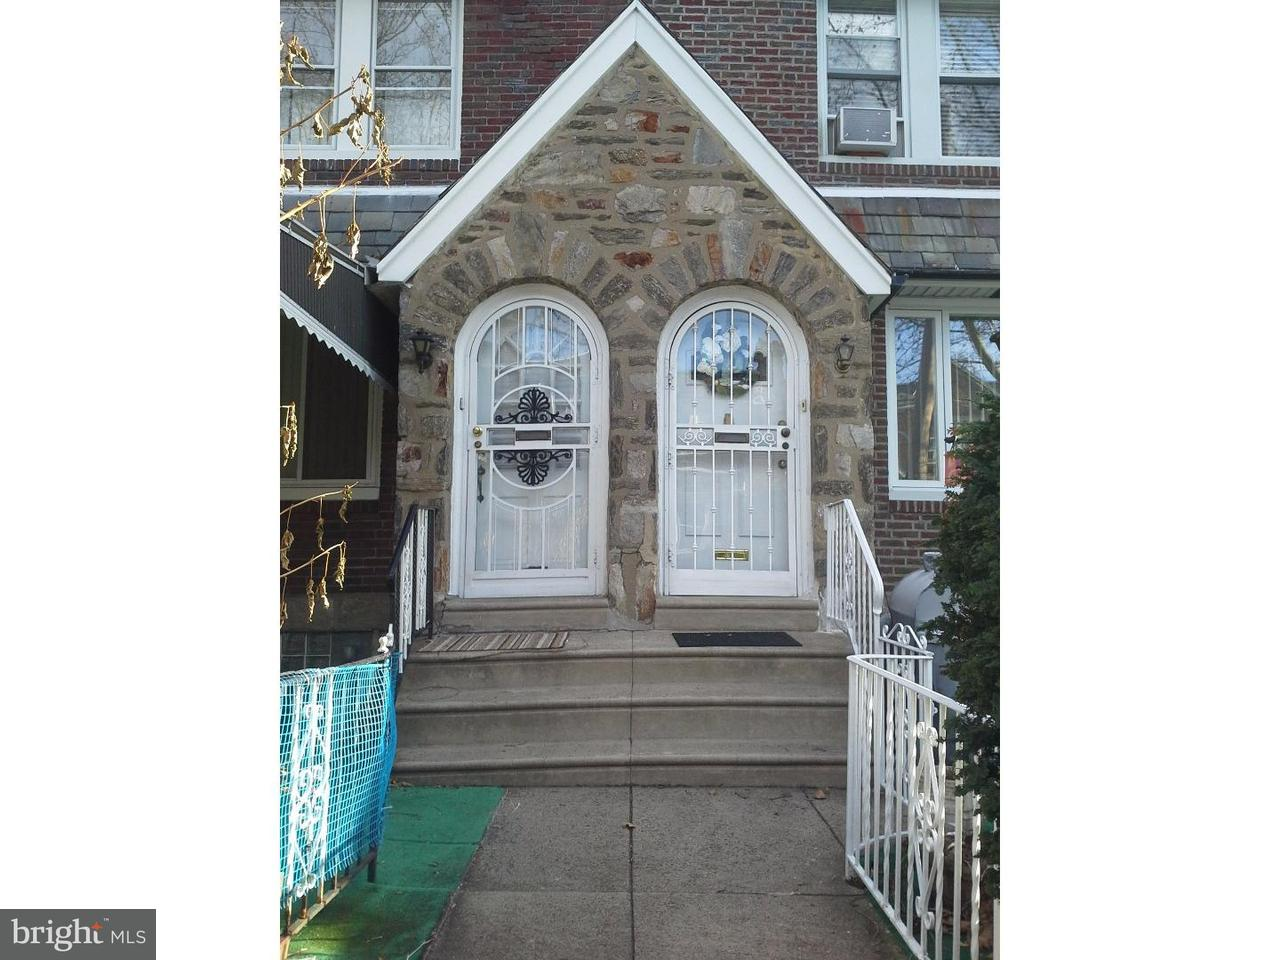 2139 N Hobart Philadelphia, PA 19131